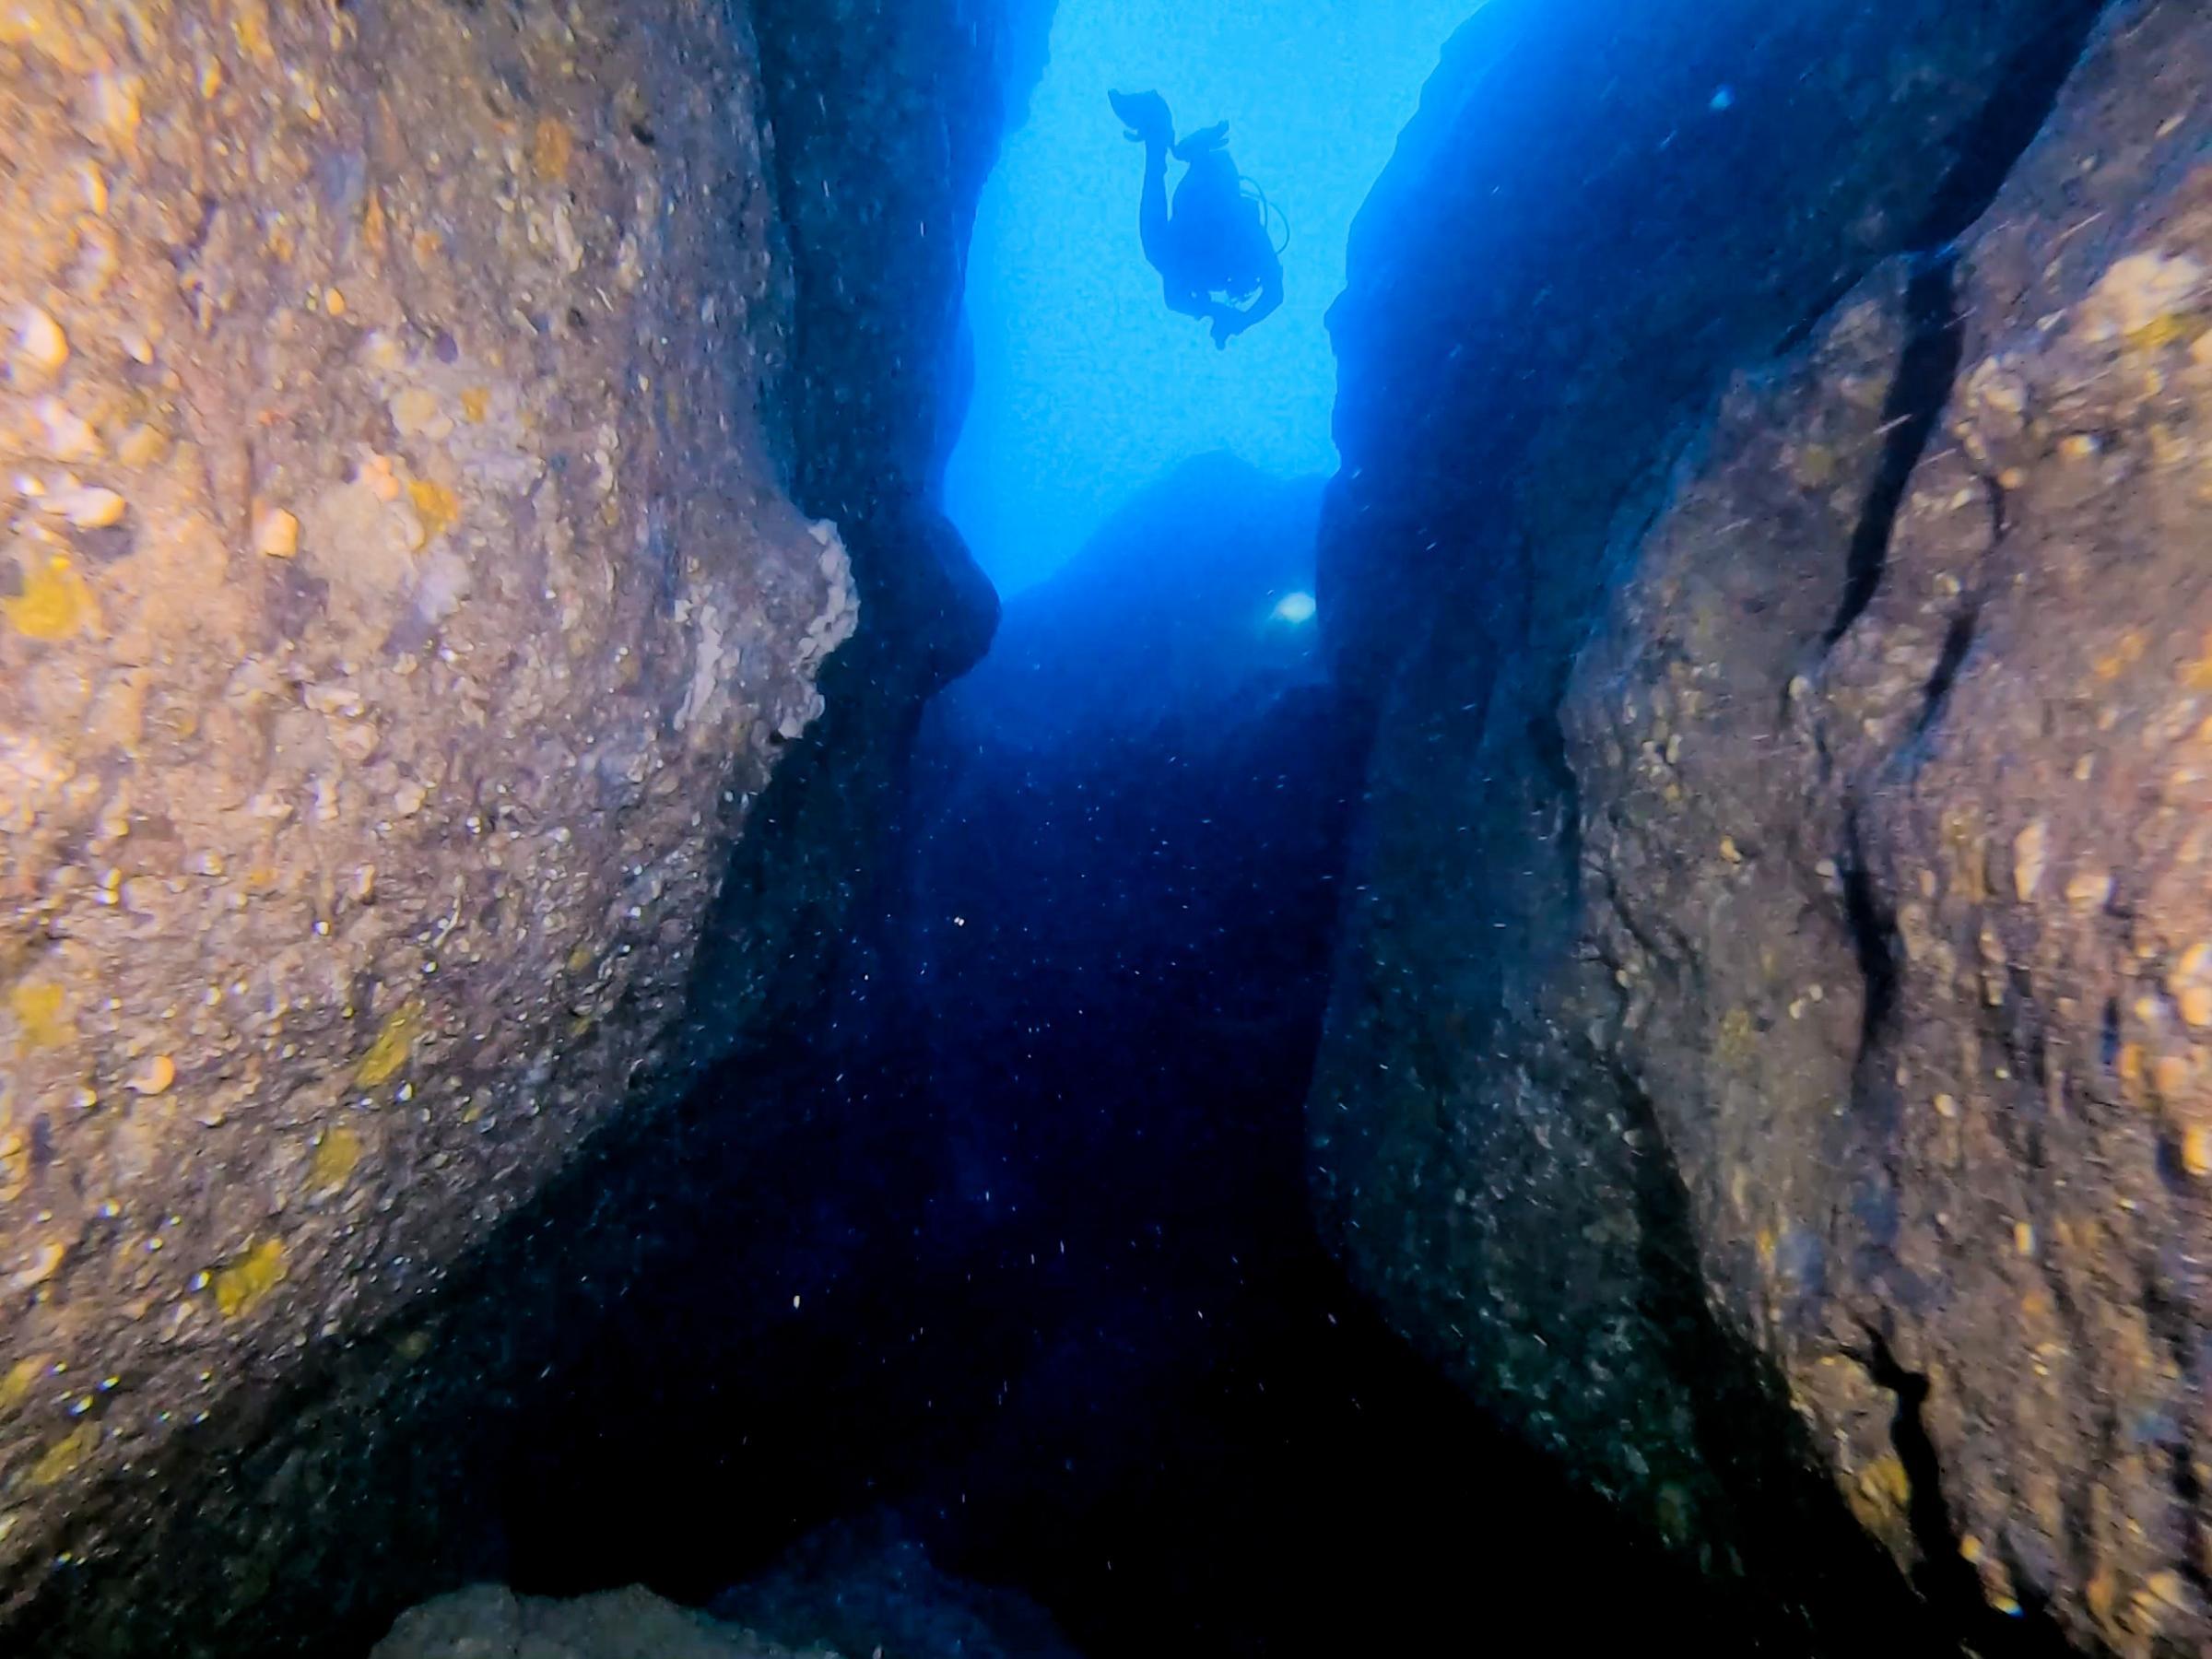 Boulders creating interesting dive paths [Adam Sant]